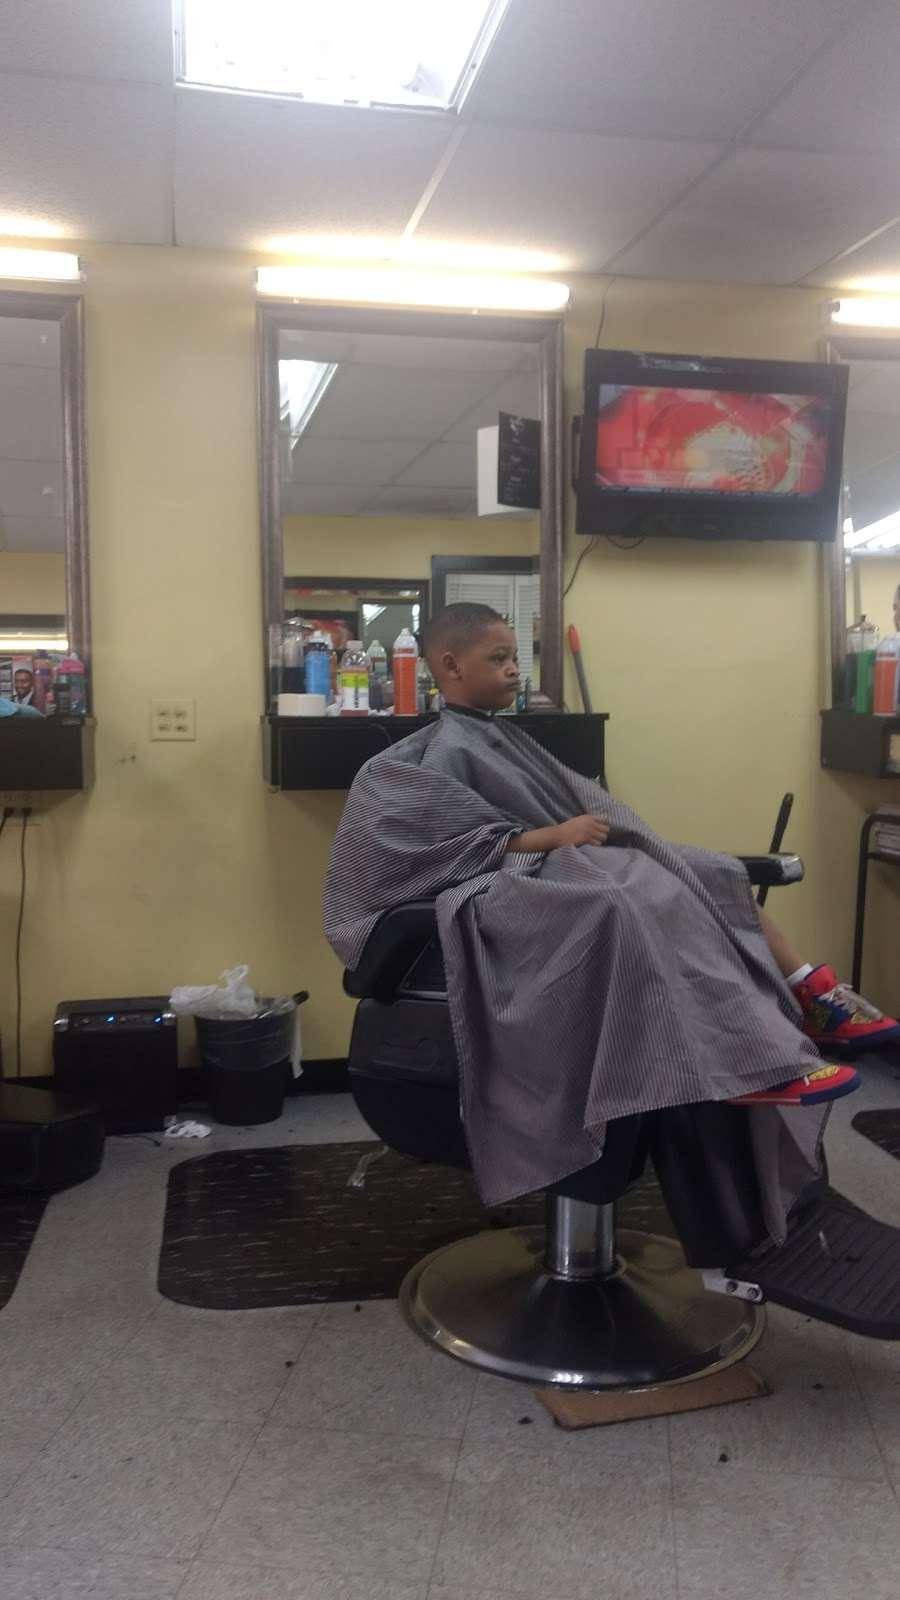 Headliner LLC - hair care  | Photo 2 of 6 | Address: 1551 Springfield Ave, Maplewood, NJ 07040, USA | Phone: (973) 378-5941